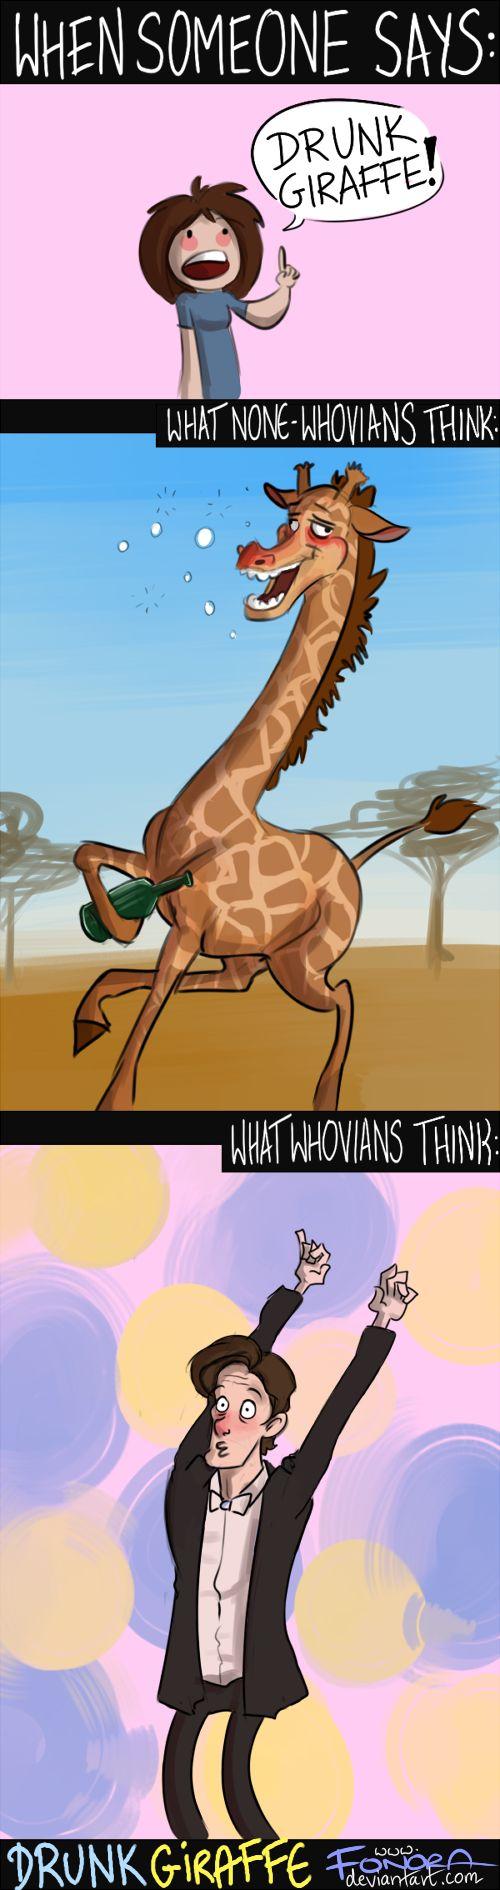 Drunk Giraffe by Fonora.deviantart.com on @DeviantArt